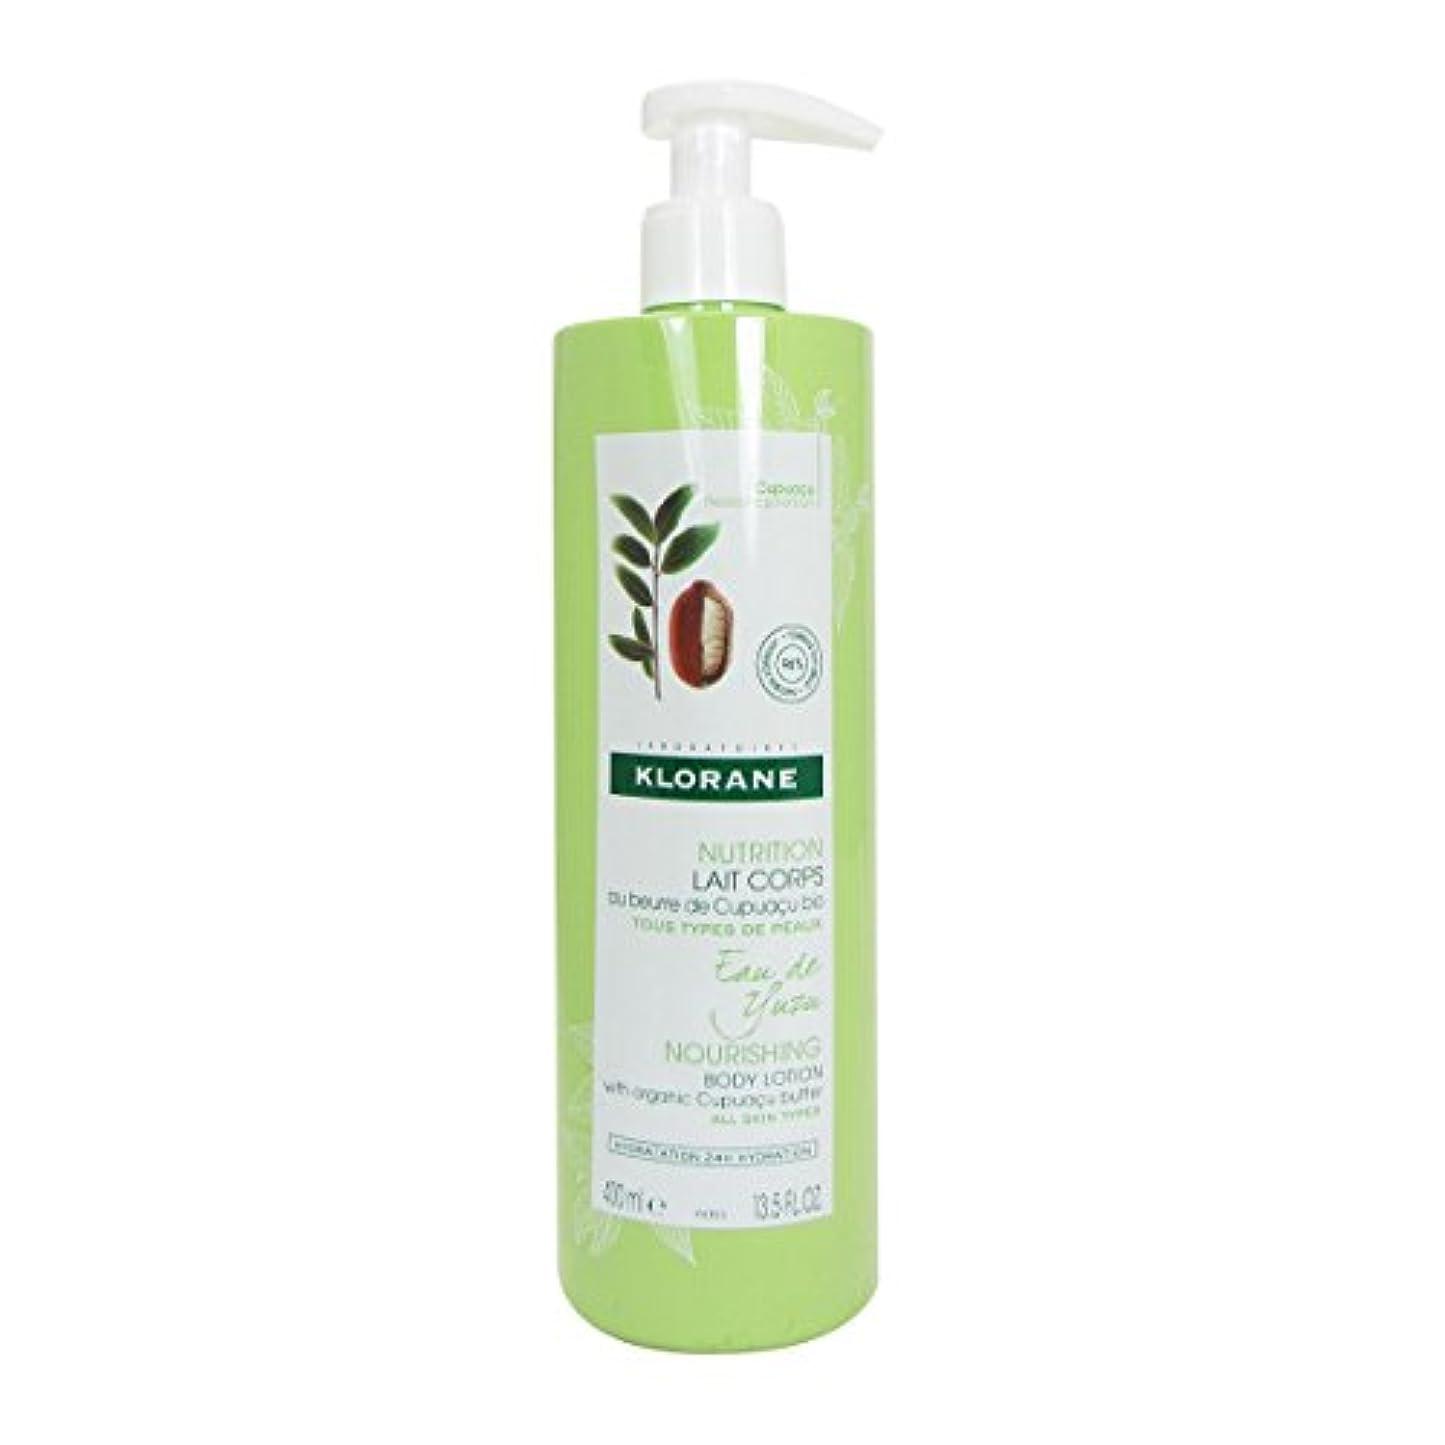 空中教育学仮定するKlorane Nutrition Yuzu Water Body Milk 400ml [並行輸入品]